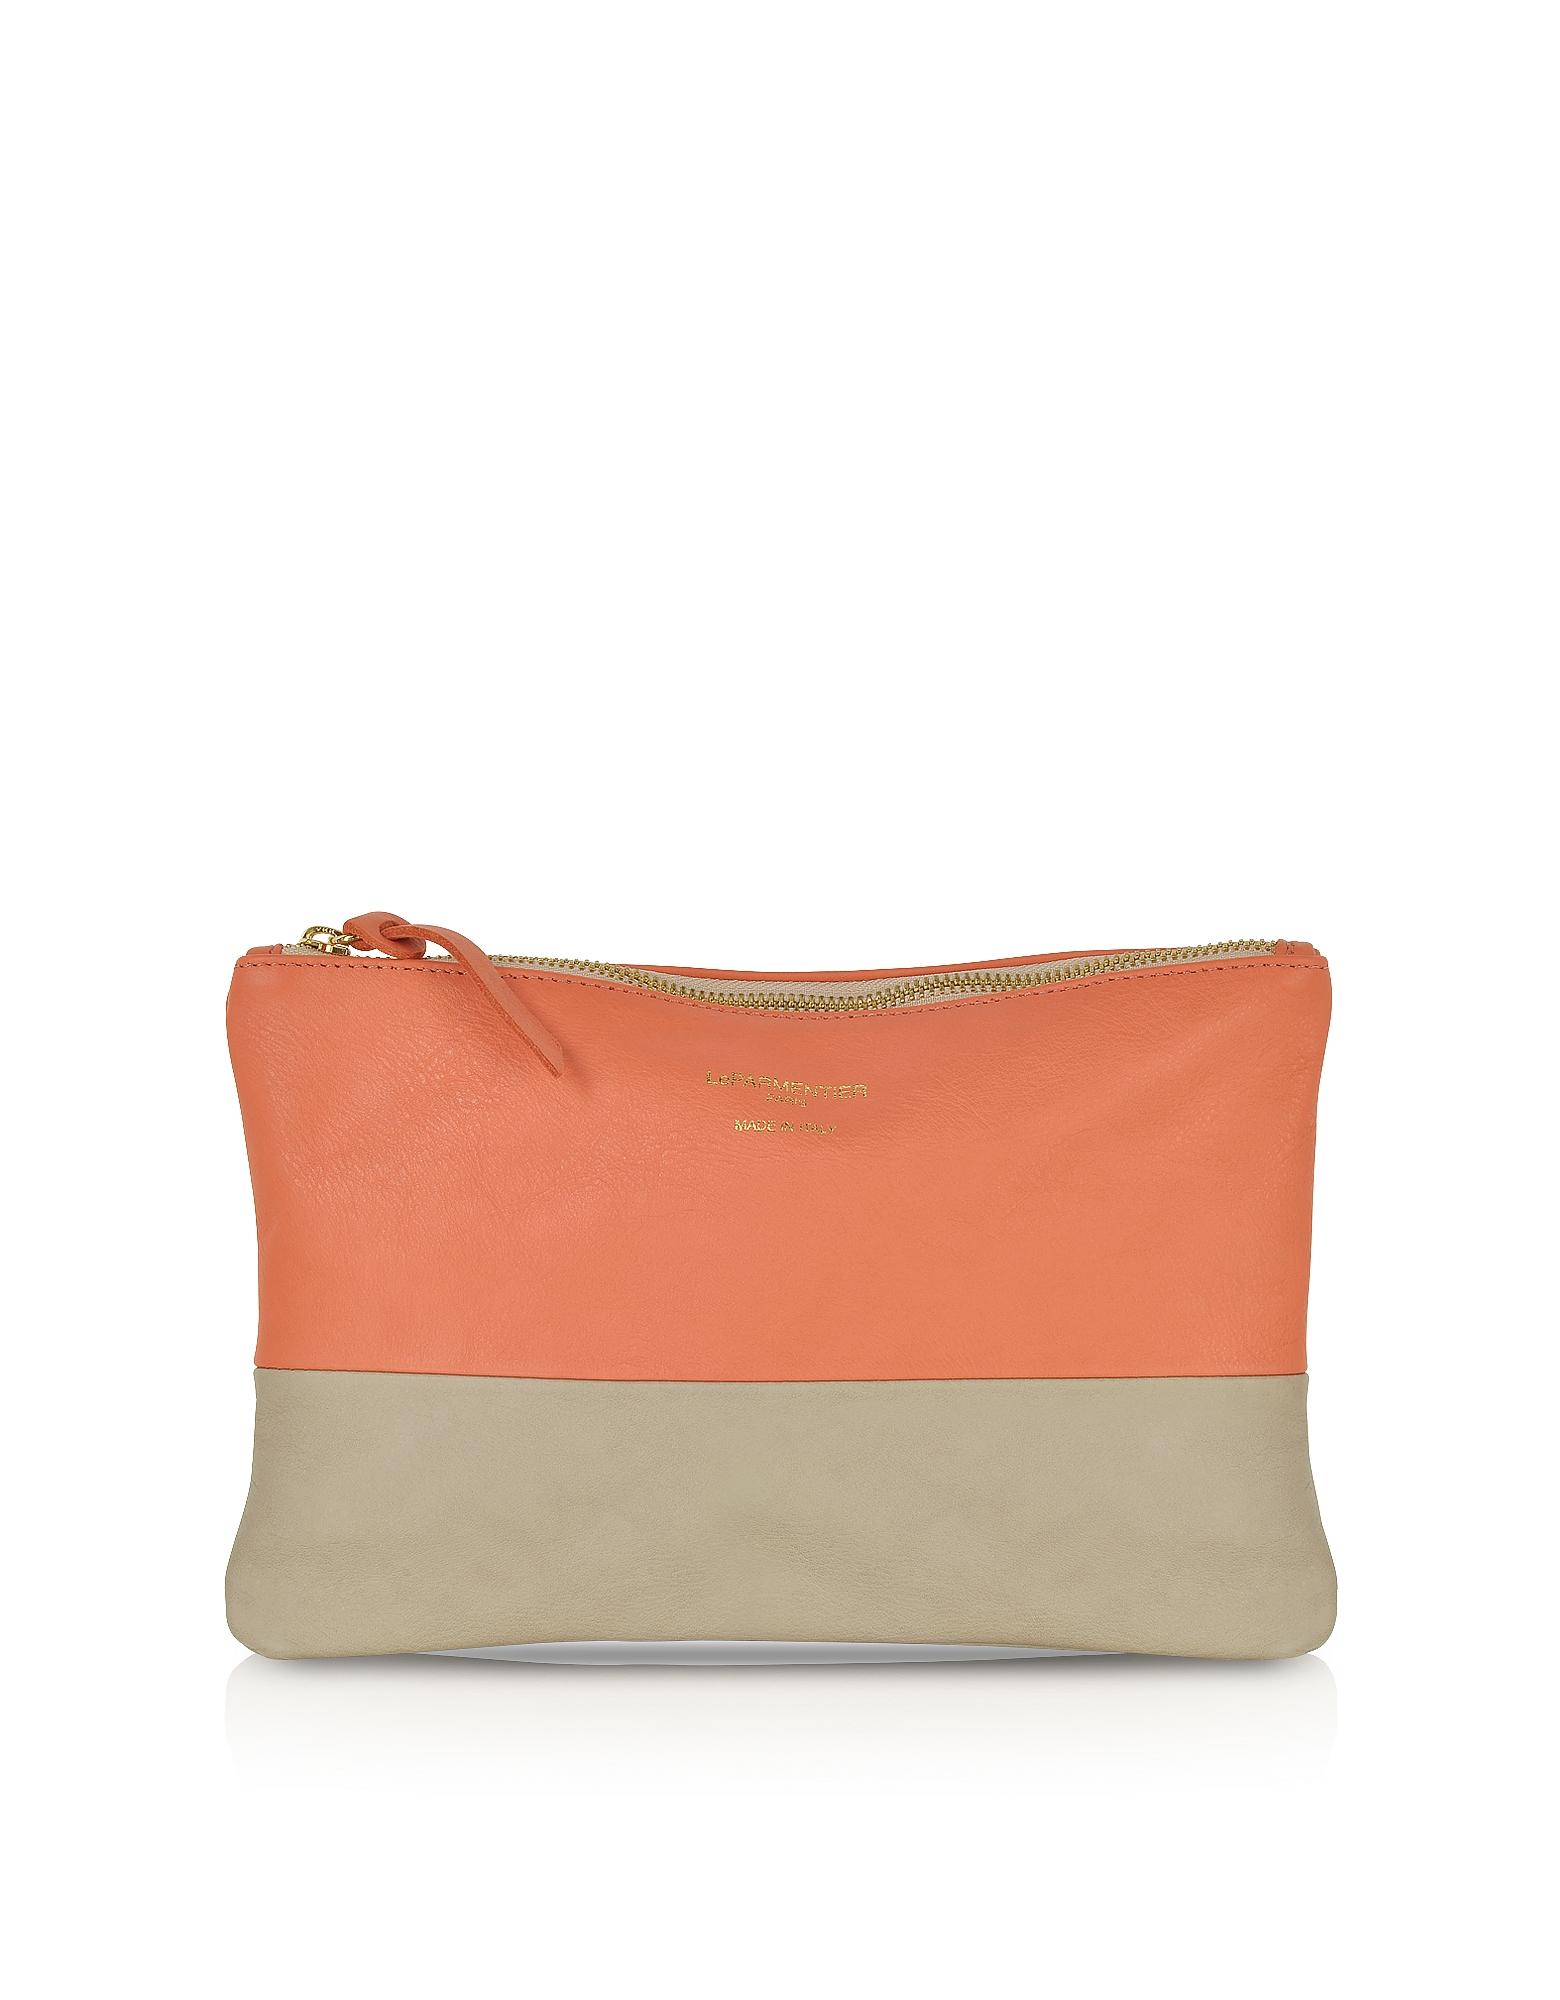 Le Parmentier Designer Handbags, Color Block Nappa Leather Zip Pouch